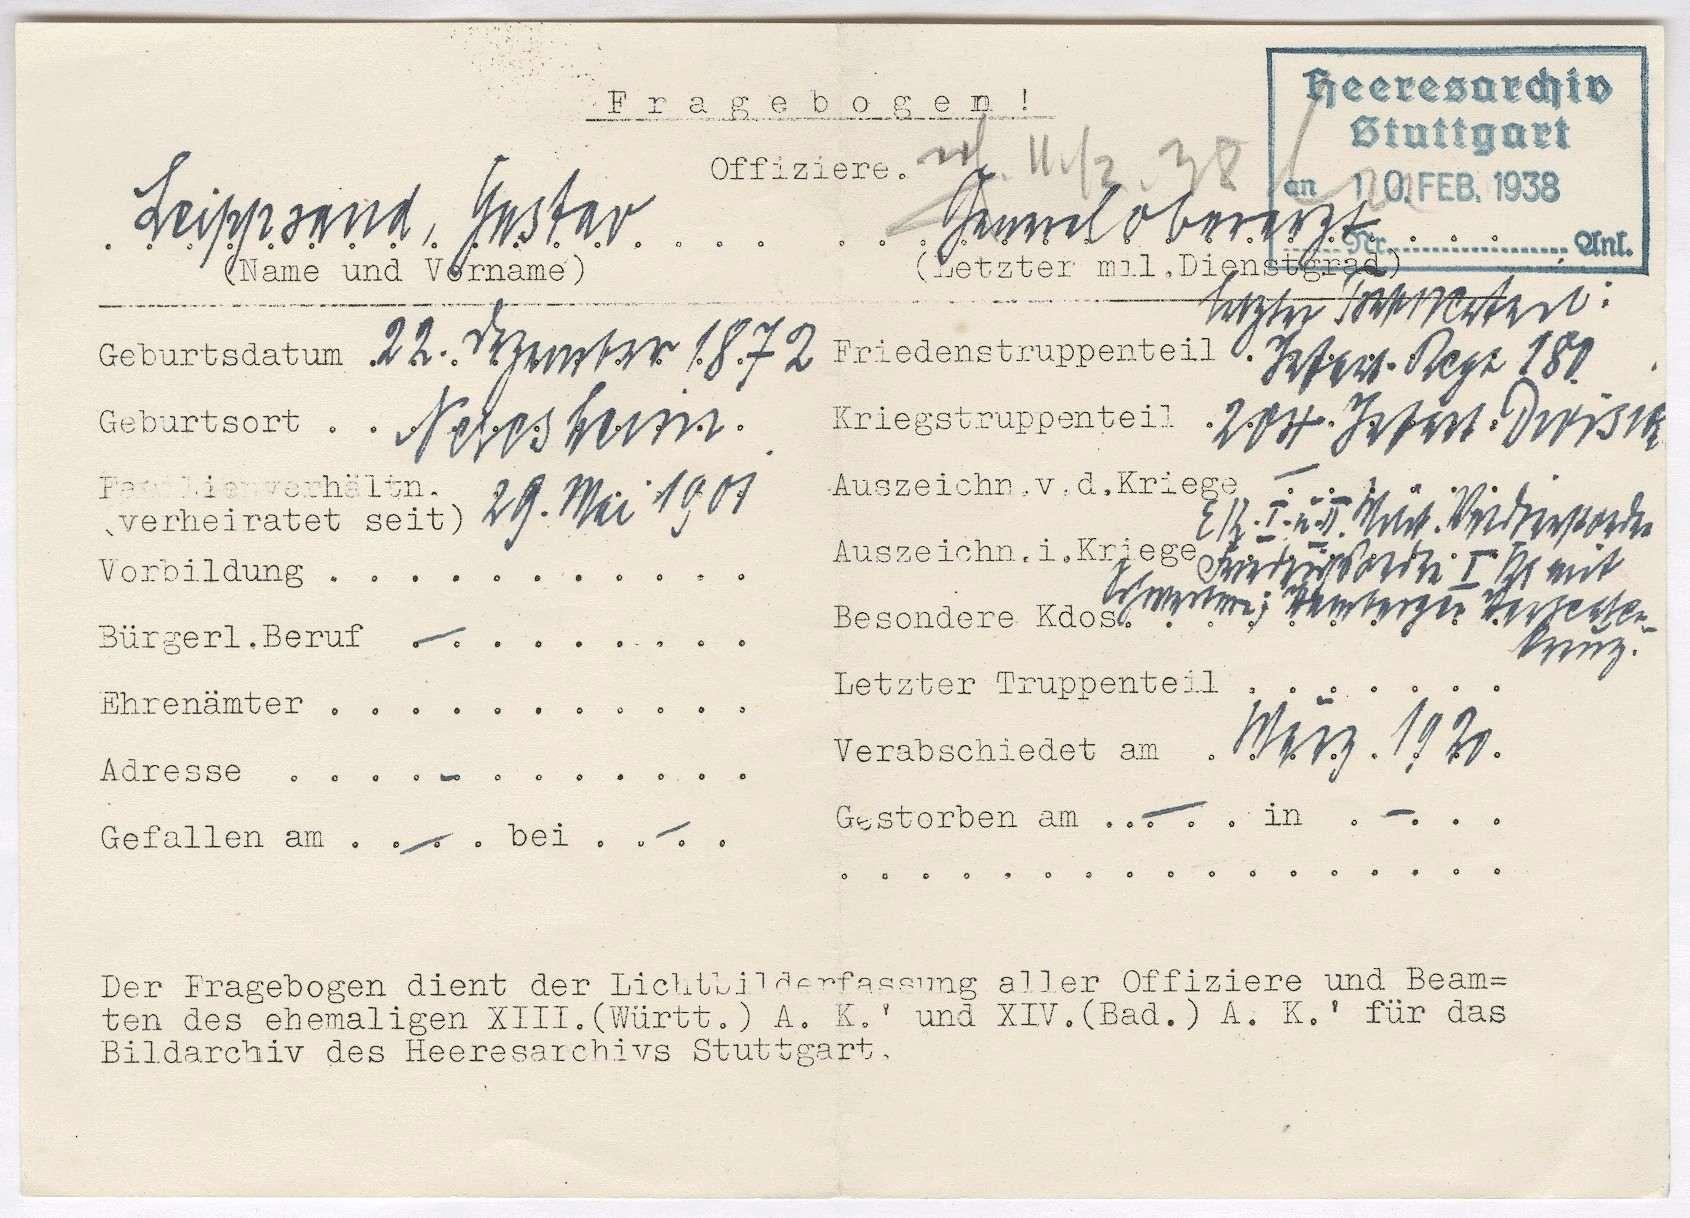 Leipprand, Gustav, Bild 2